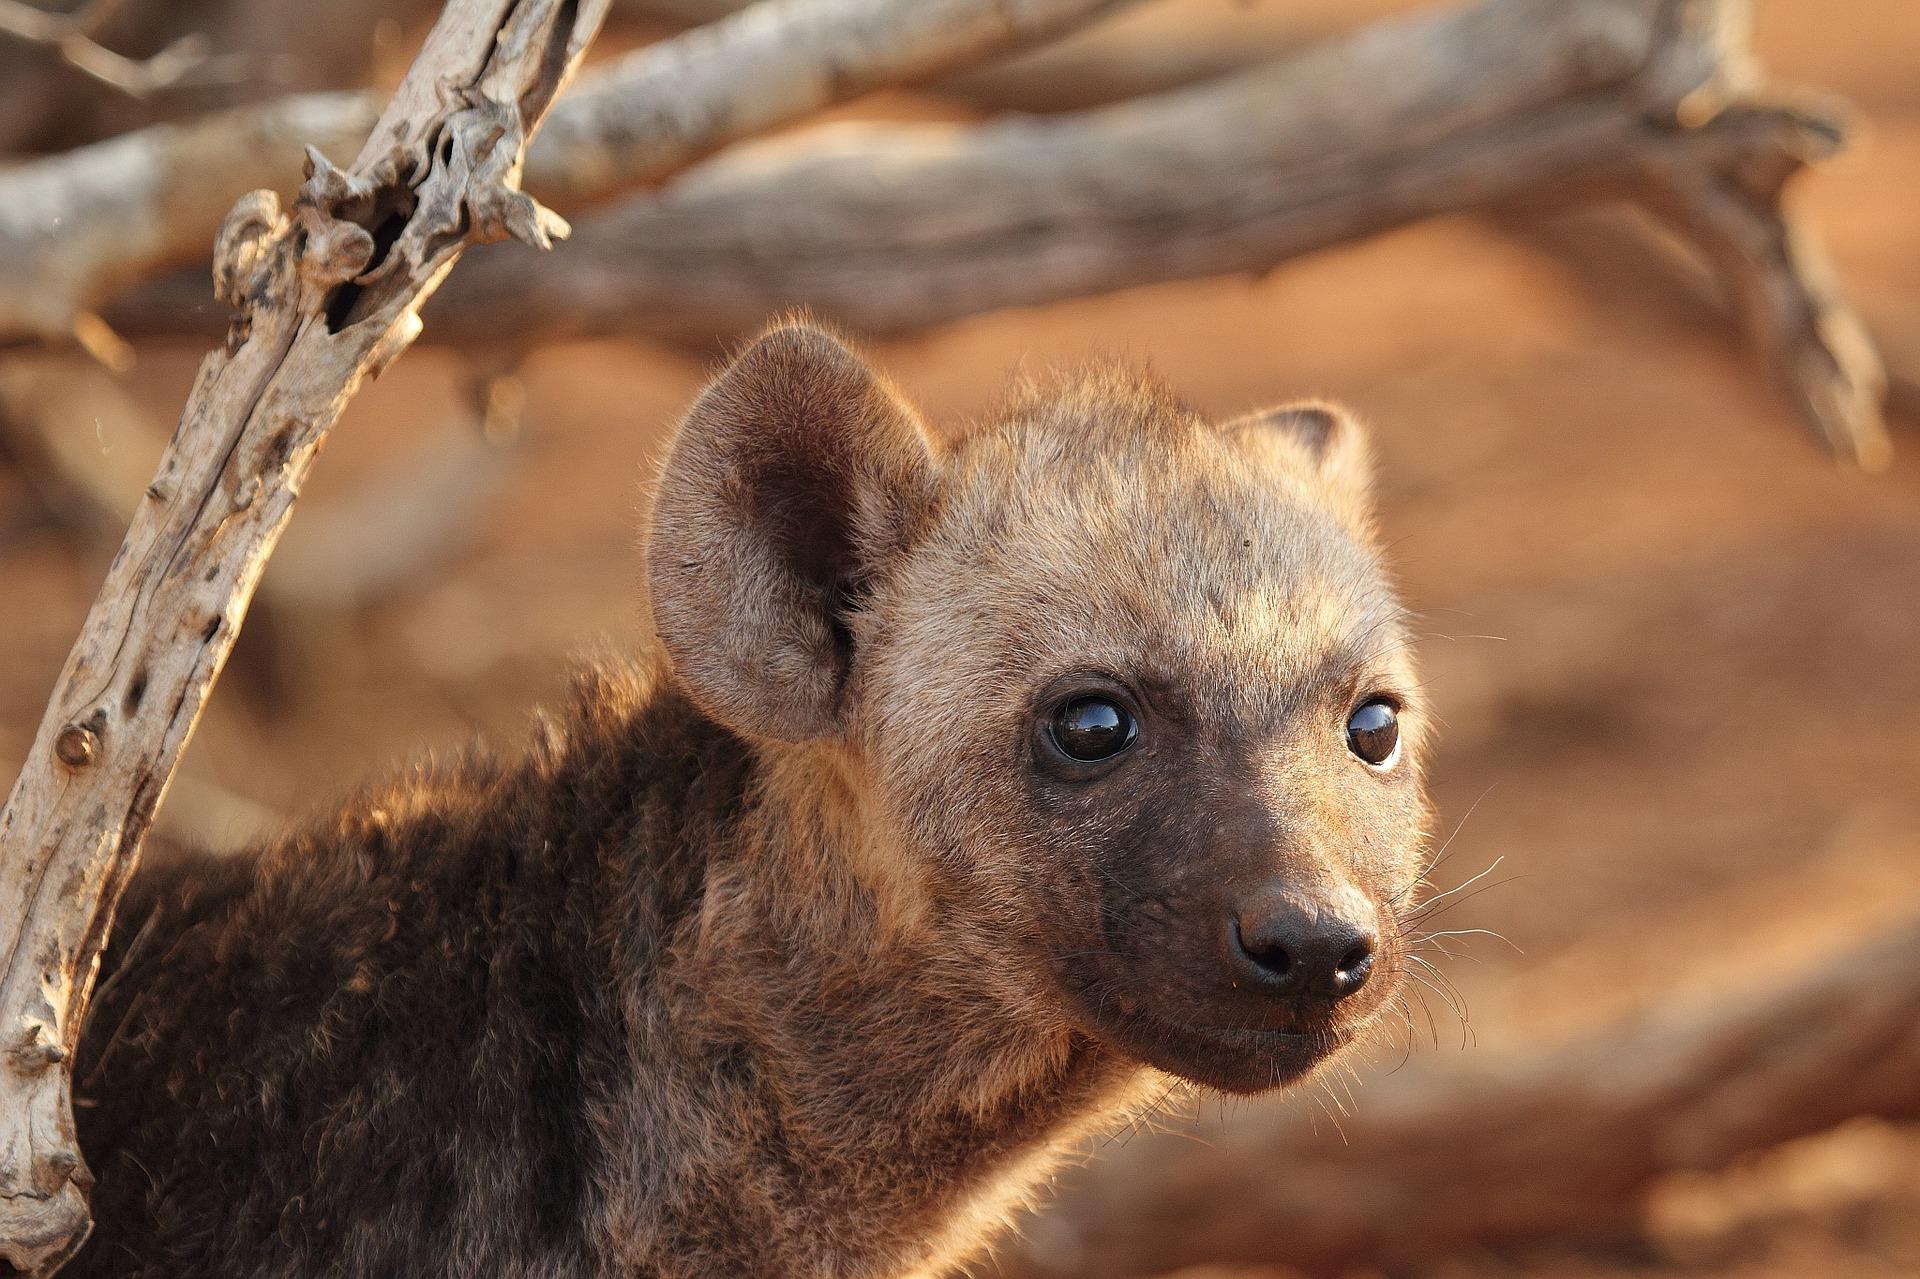 Baby Hyena, Hyena Cub